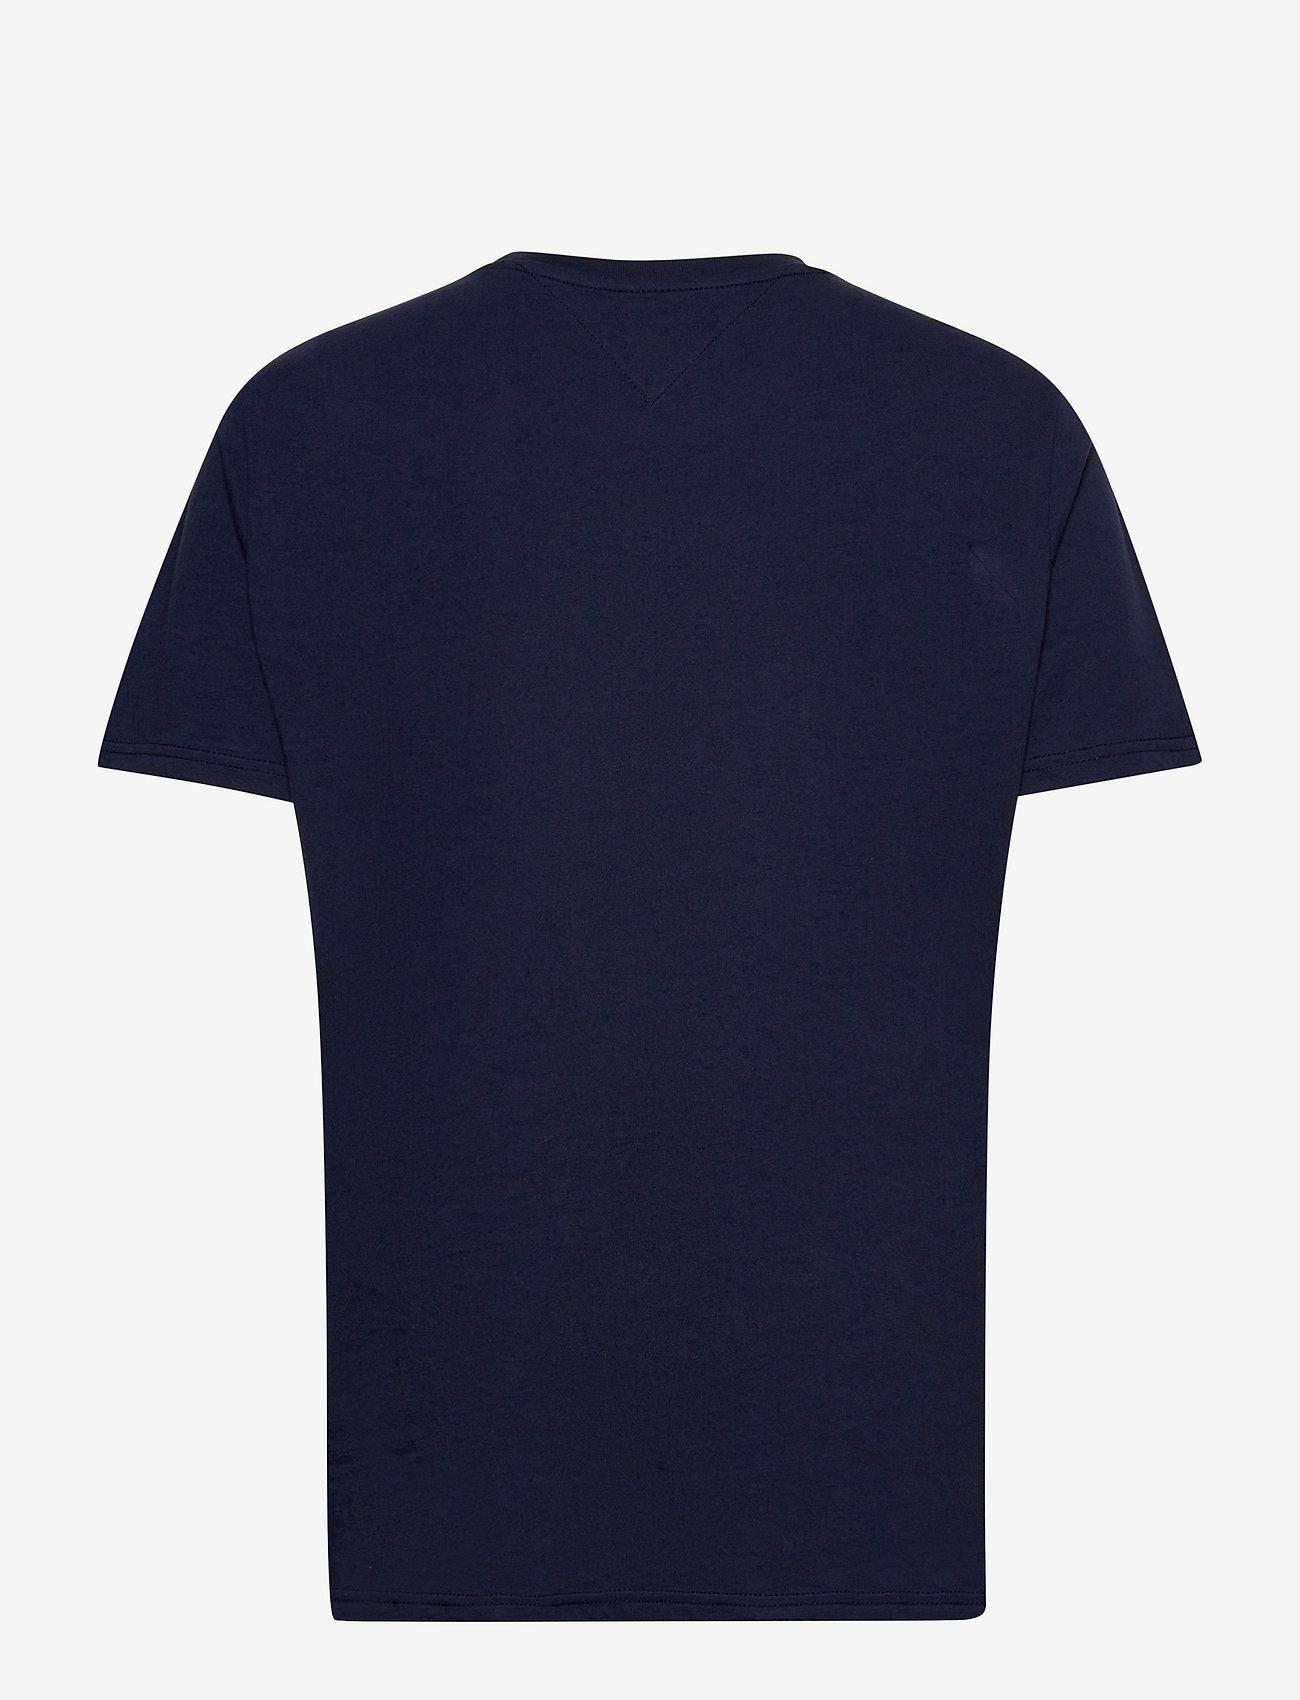 Tommy Jeans - TJM ESSENTIAL GRAPHIC TEE - kortärmade t-shirts - twilight navy - 1